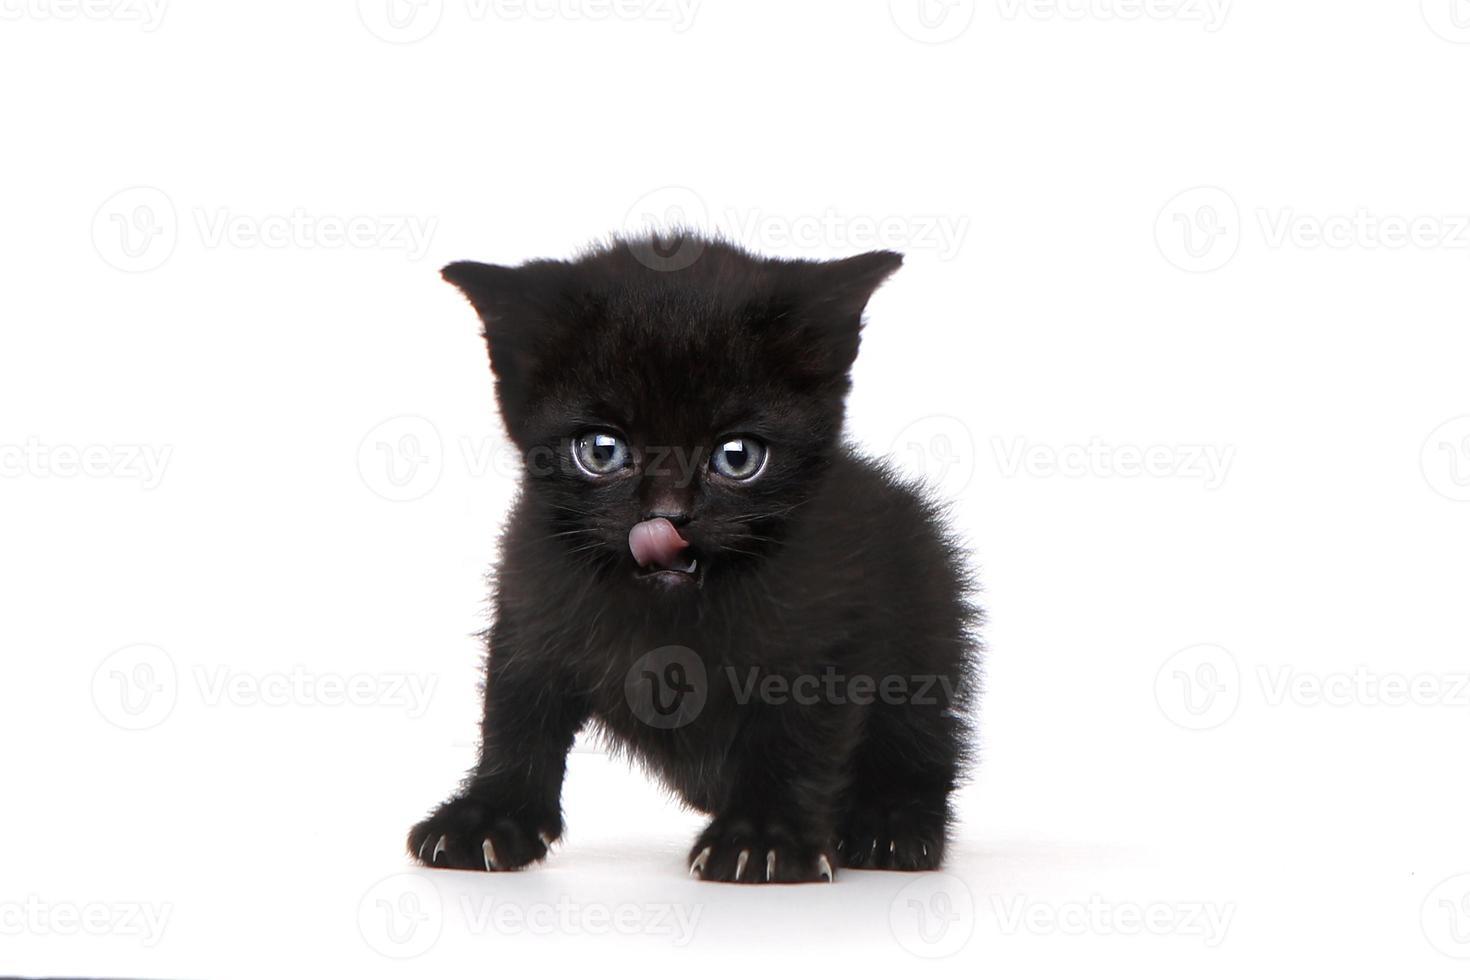 Solo gatito negro sobre fondo blanco con ojos grandes foto